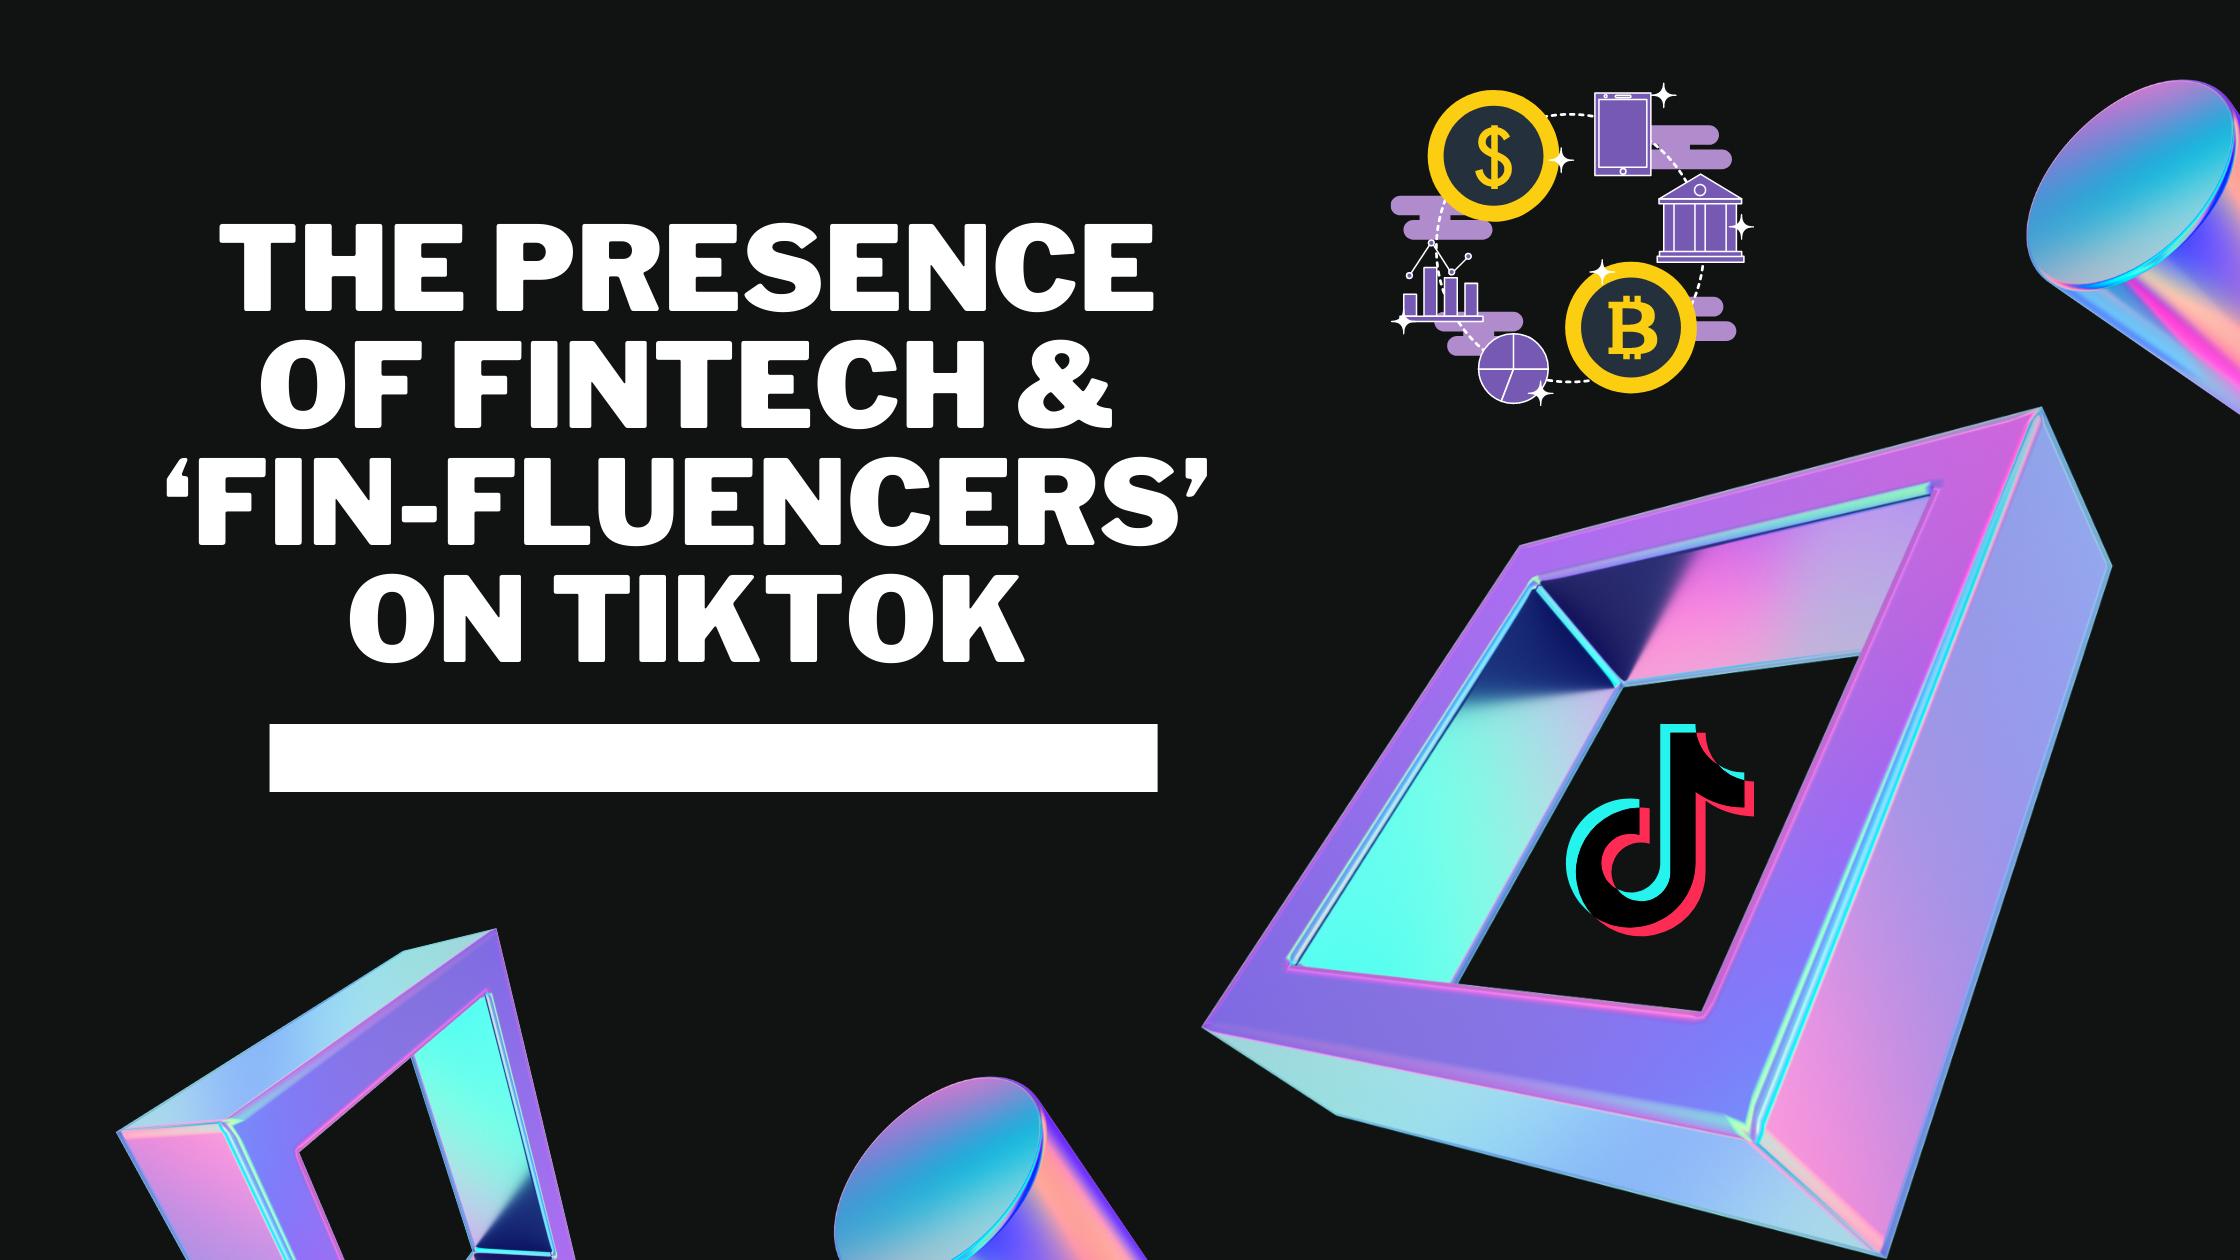 TikTok For Finance: The Rise Of Fintech & 'Fin-fluencers'